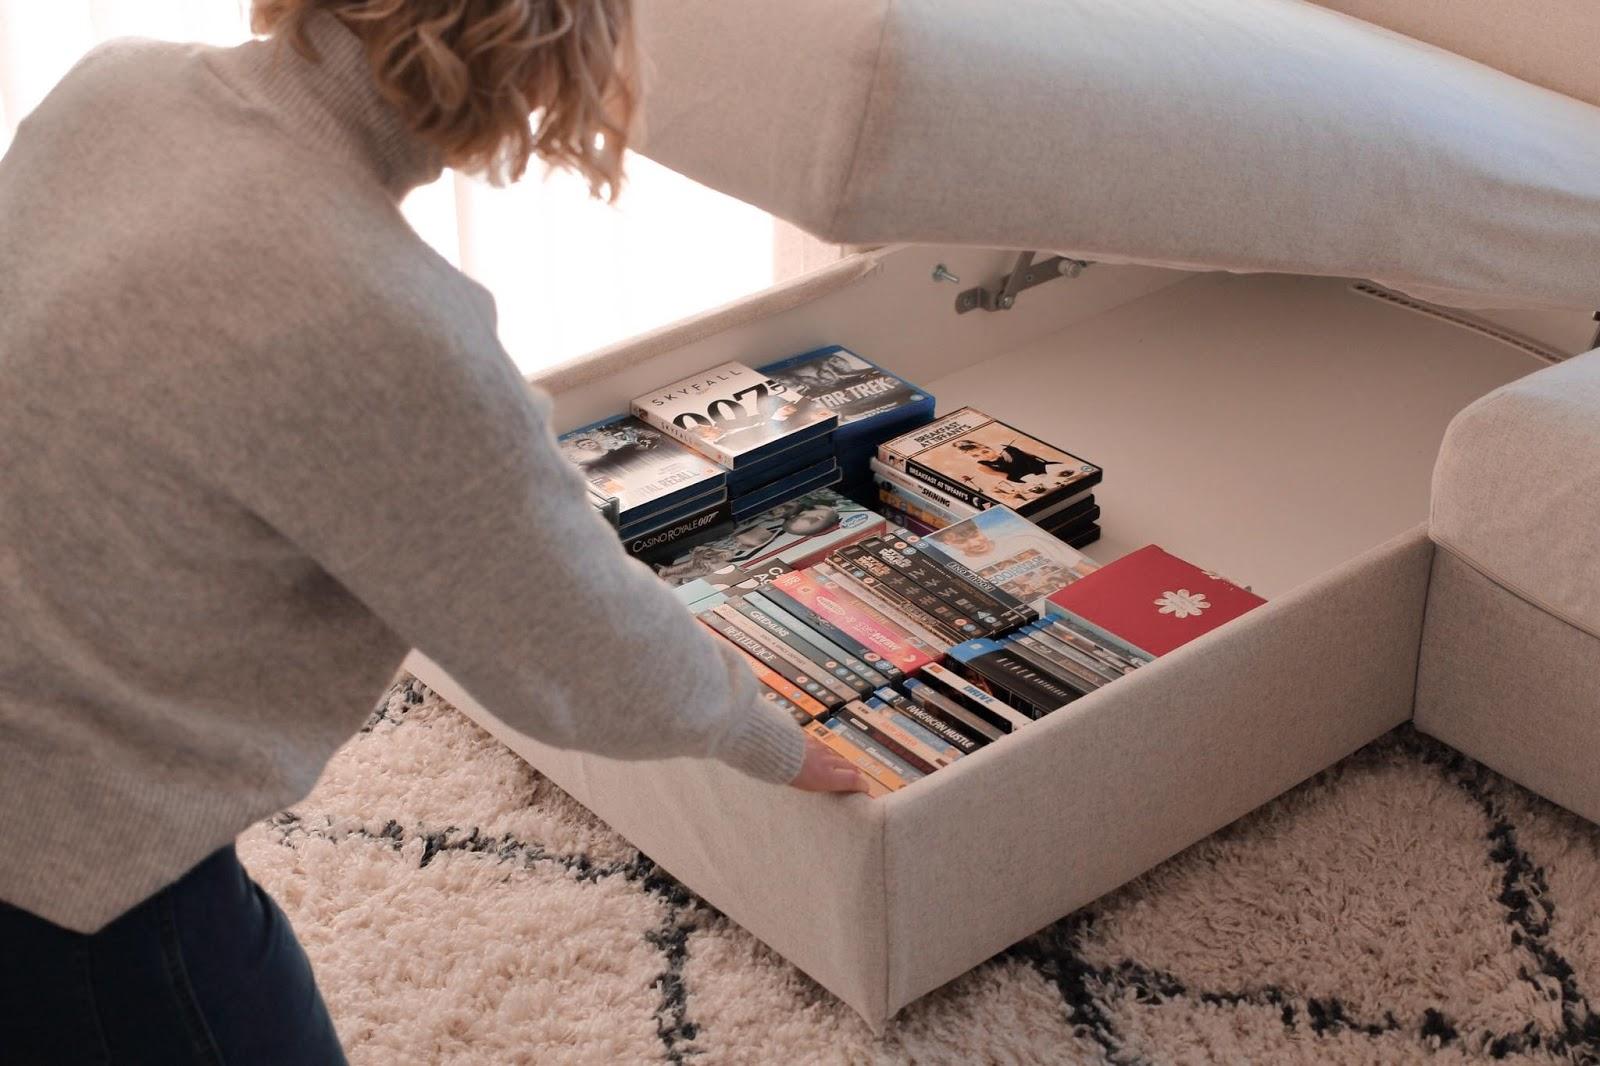 Hidden, Storage, Rental, Decor, Tiny, Home, DVDs, Tidy, Marie Kondo